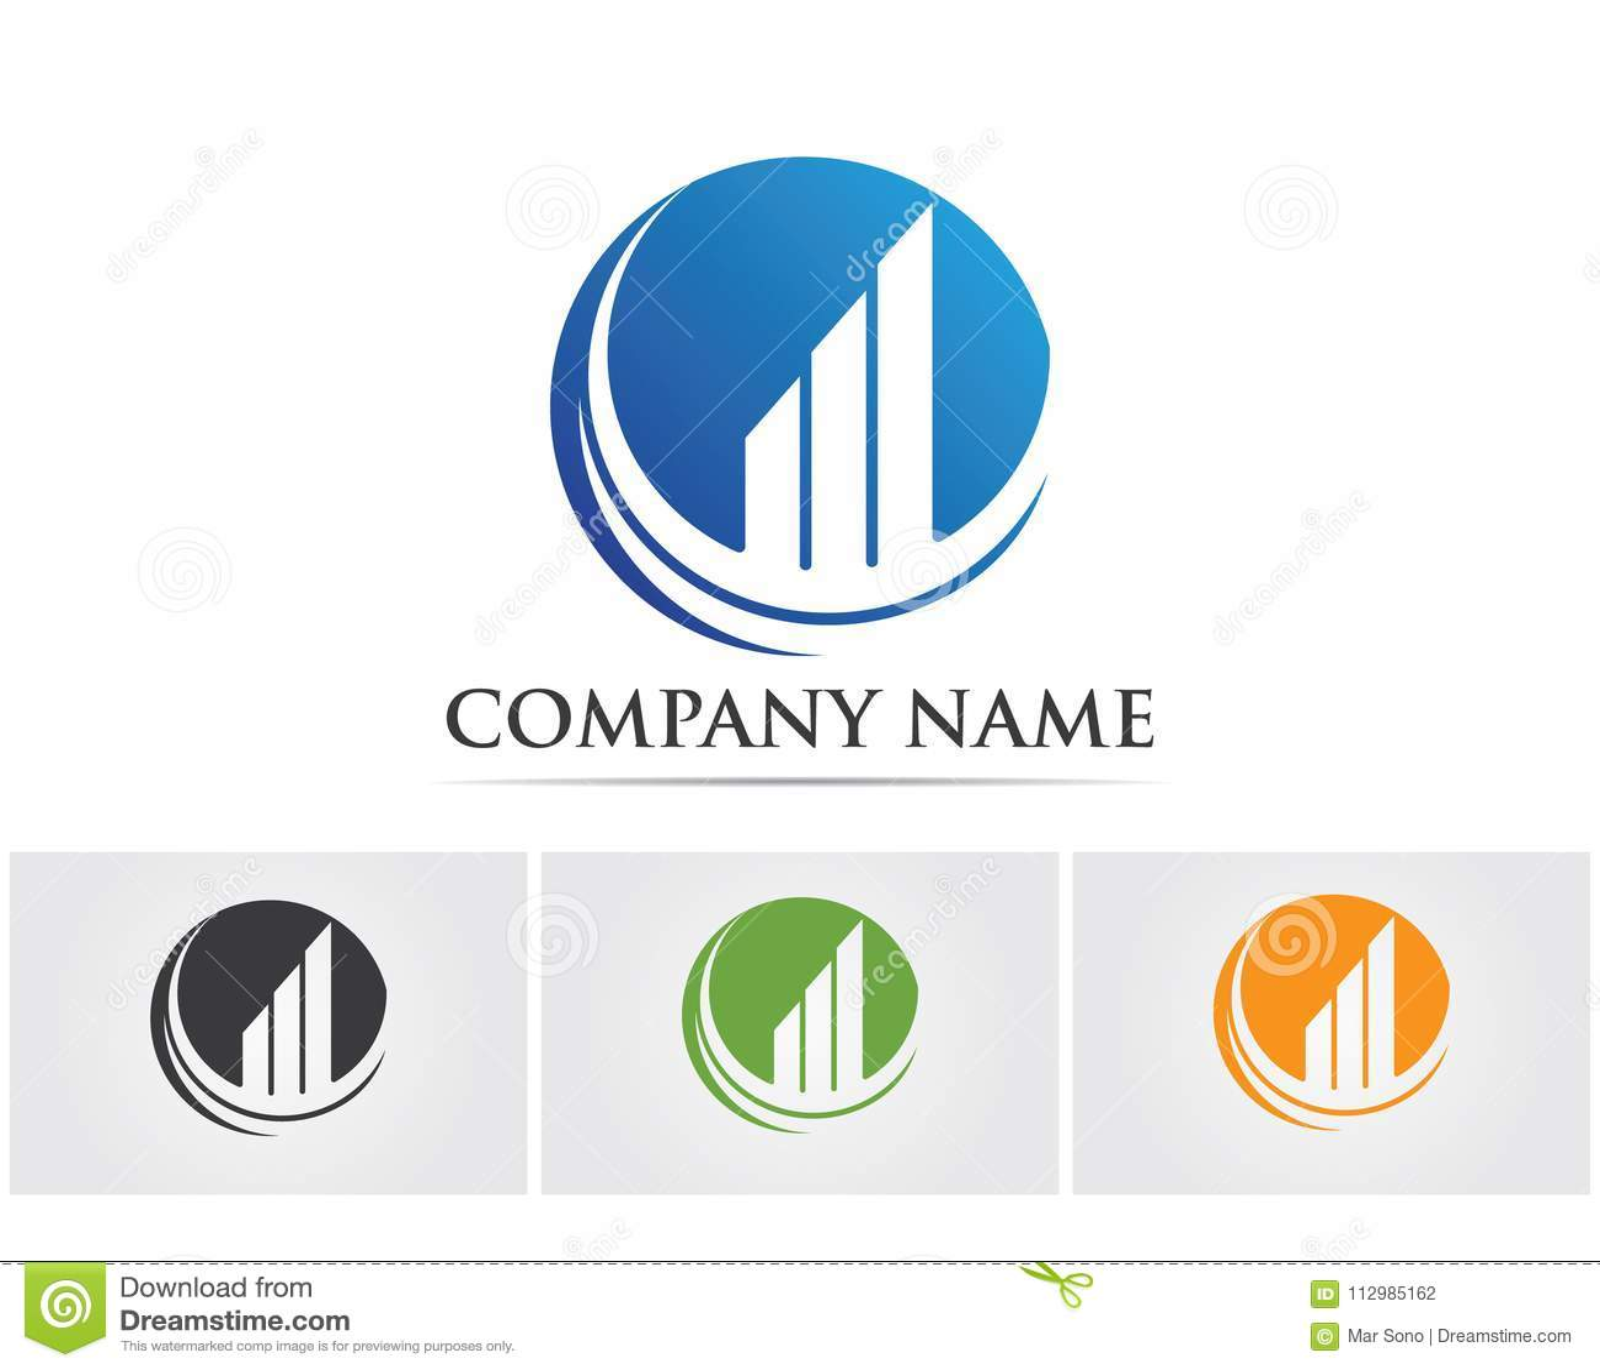 finance logo and symbols vector concept illustration..